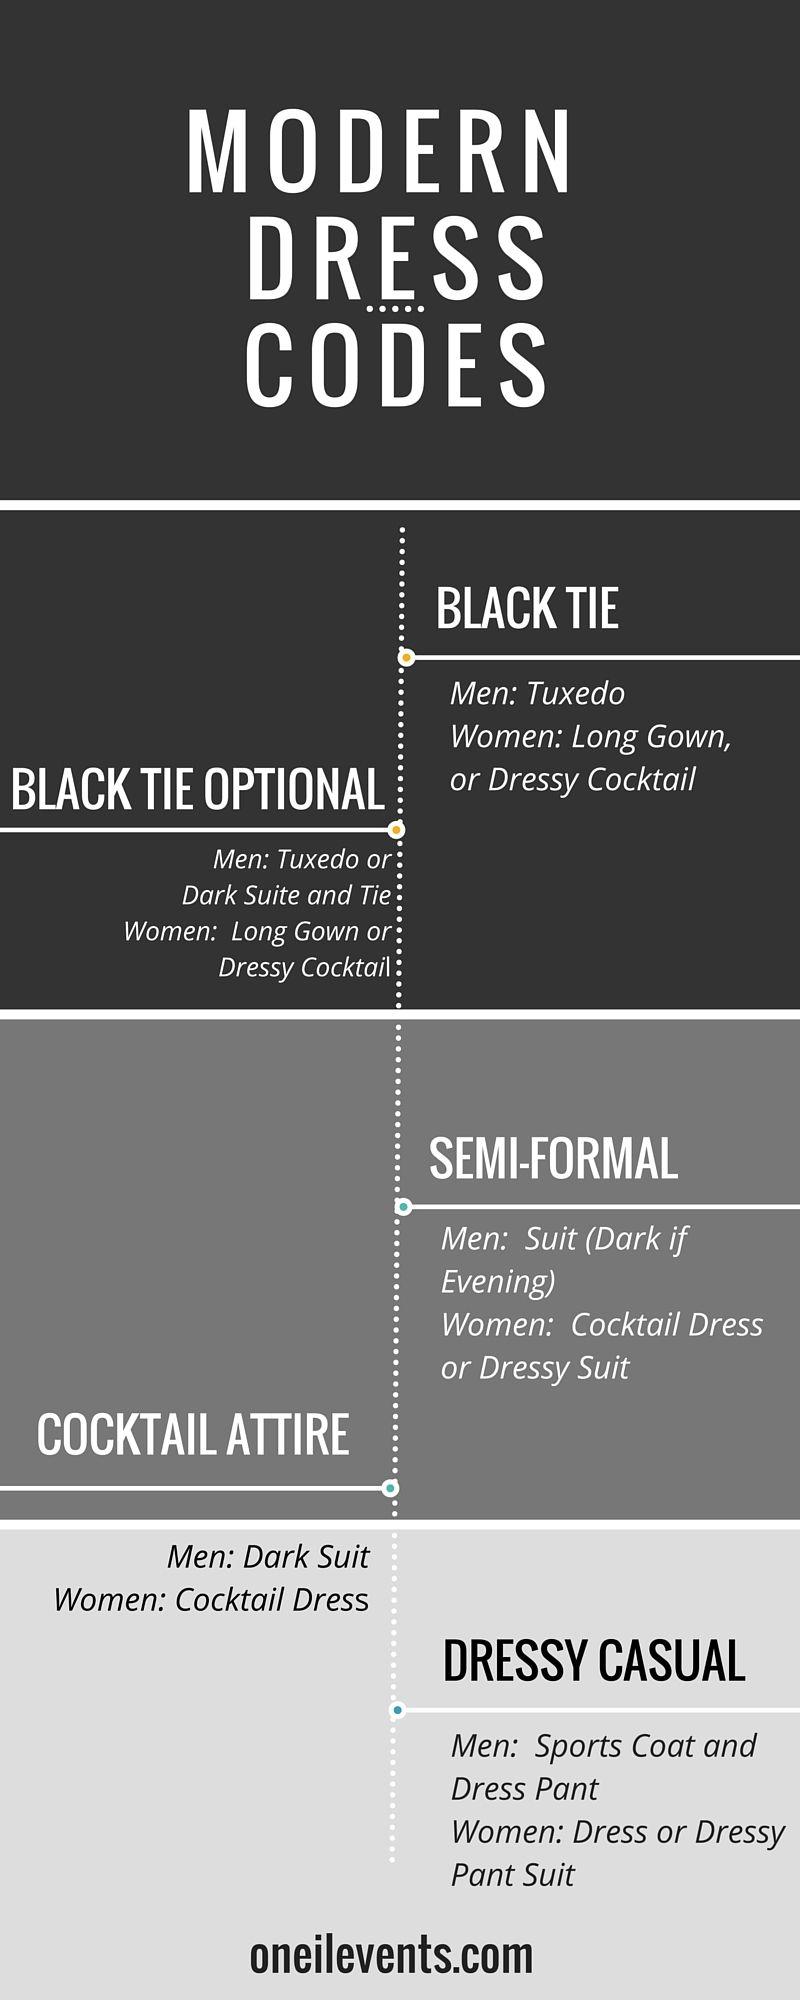 Decoding Modern Day Dress Code Etiquette | Etiquette, Dress codes ...